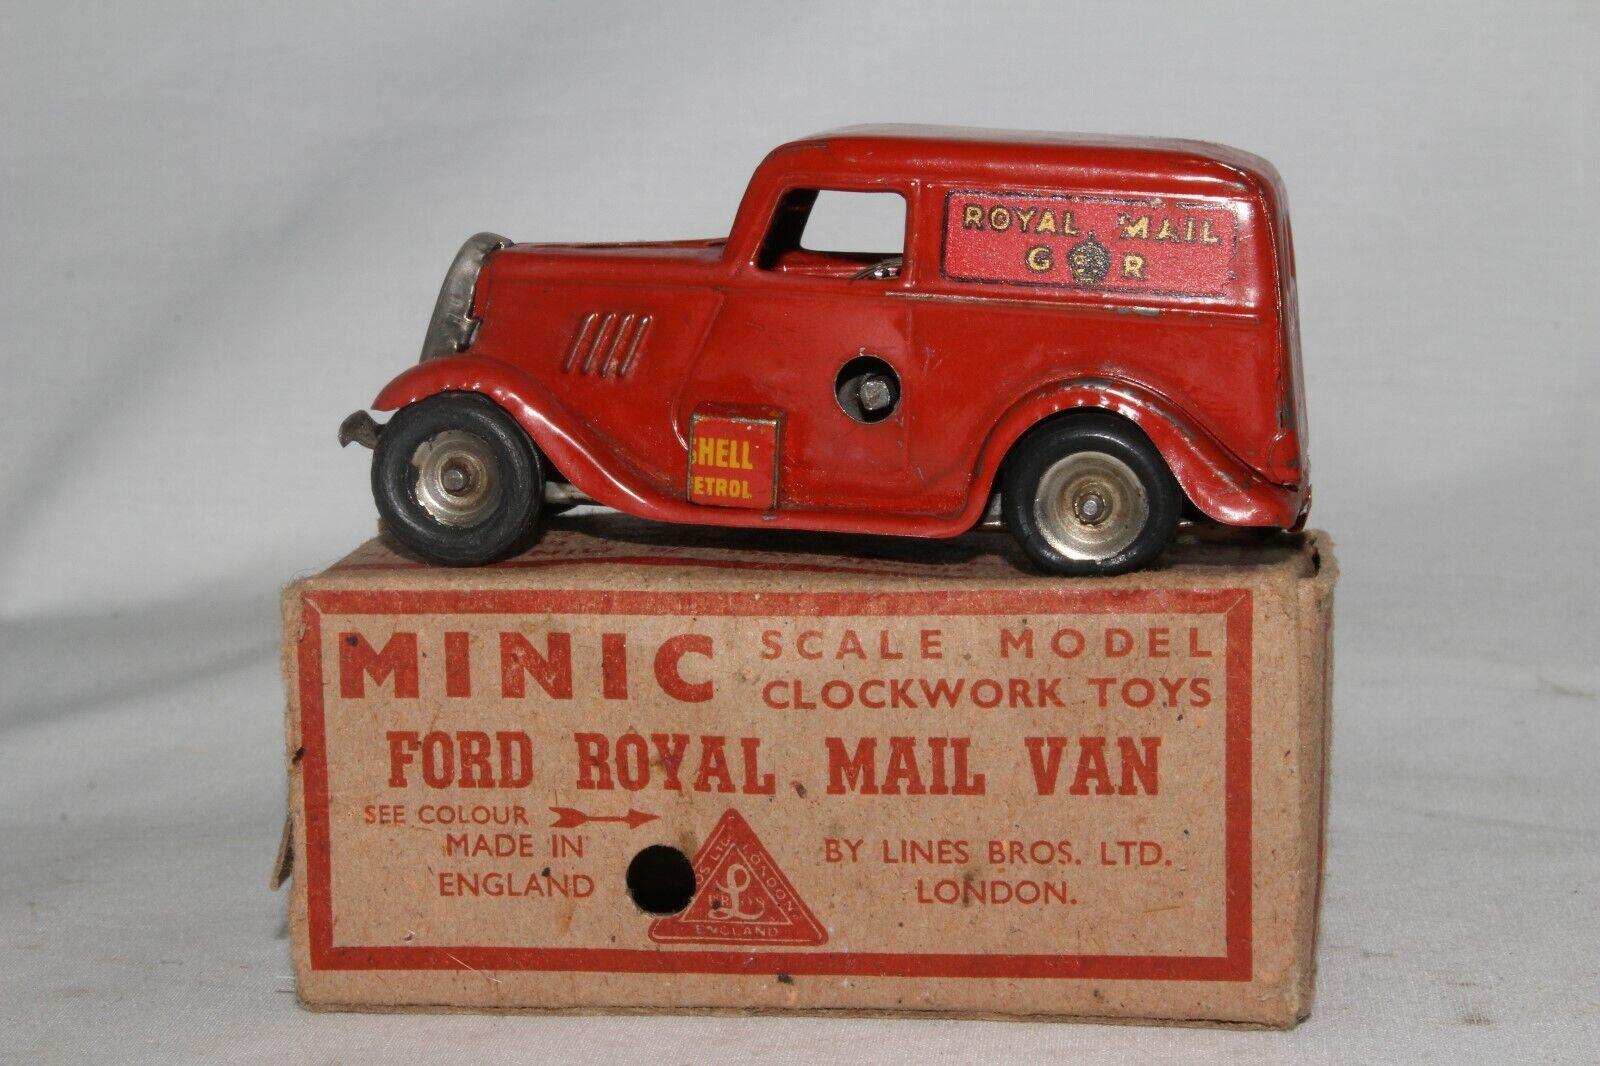 mejor precio 588ms Tri-Ang Minic Minic Minic Ford Royal Mail Furgoneta con Original Caja  más vendido